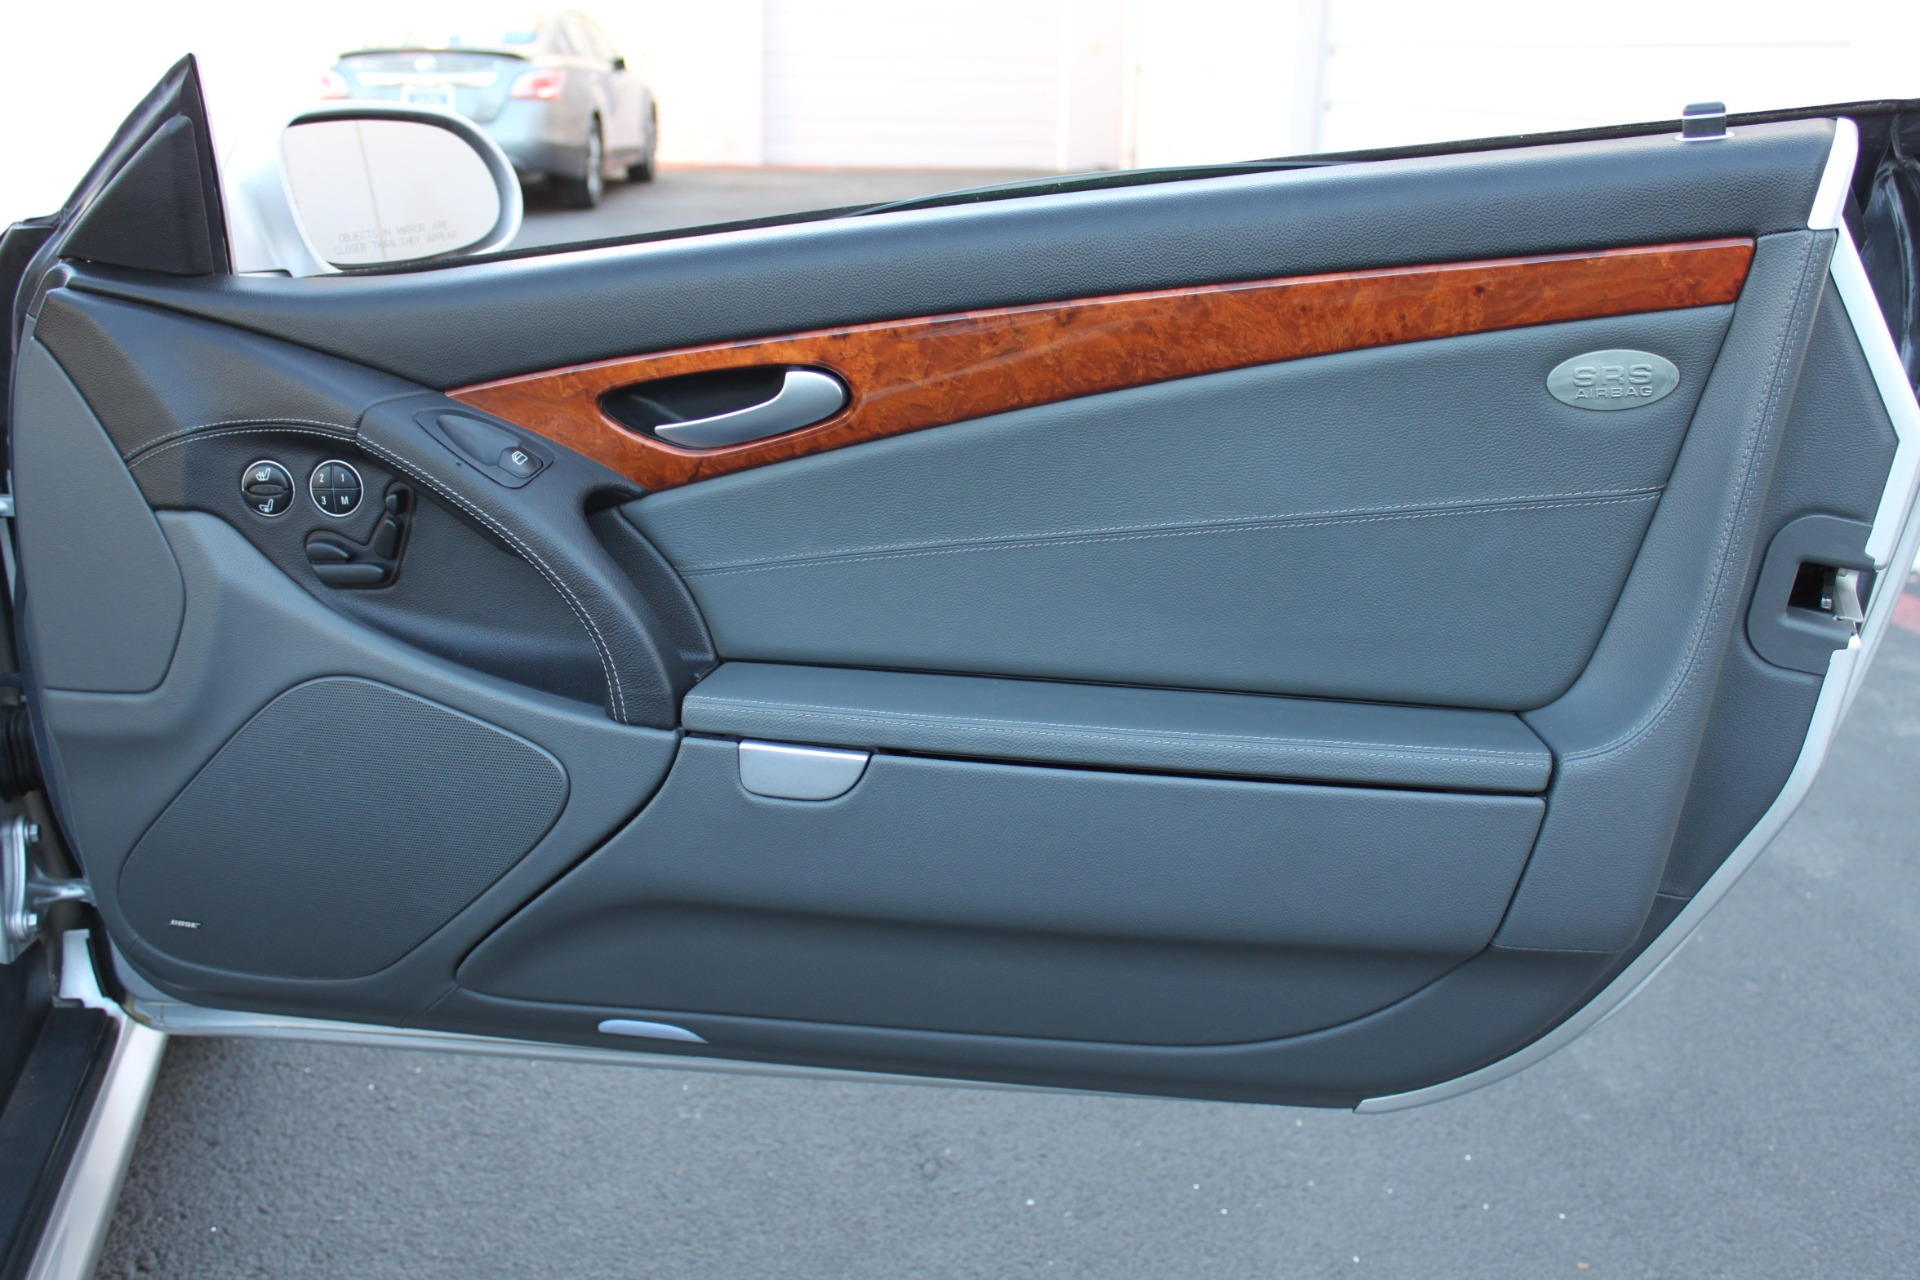 Used-2003-Mercedes-Benz-SL-Class-AMG-Wrangler